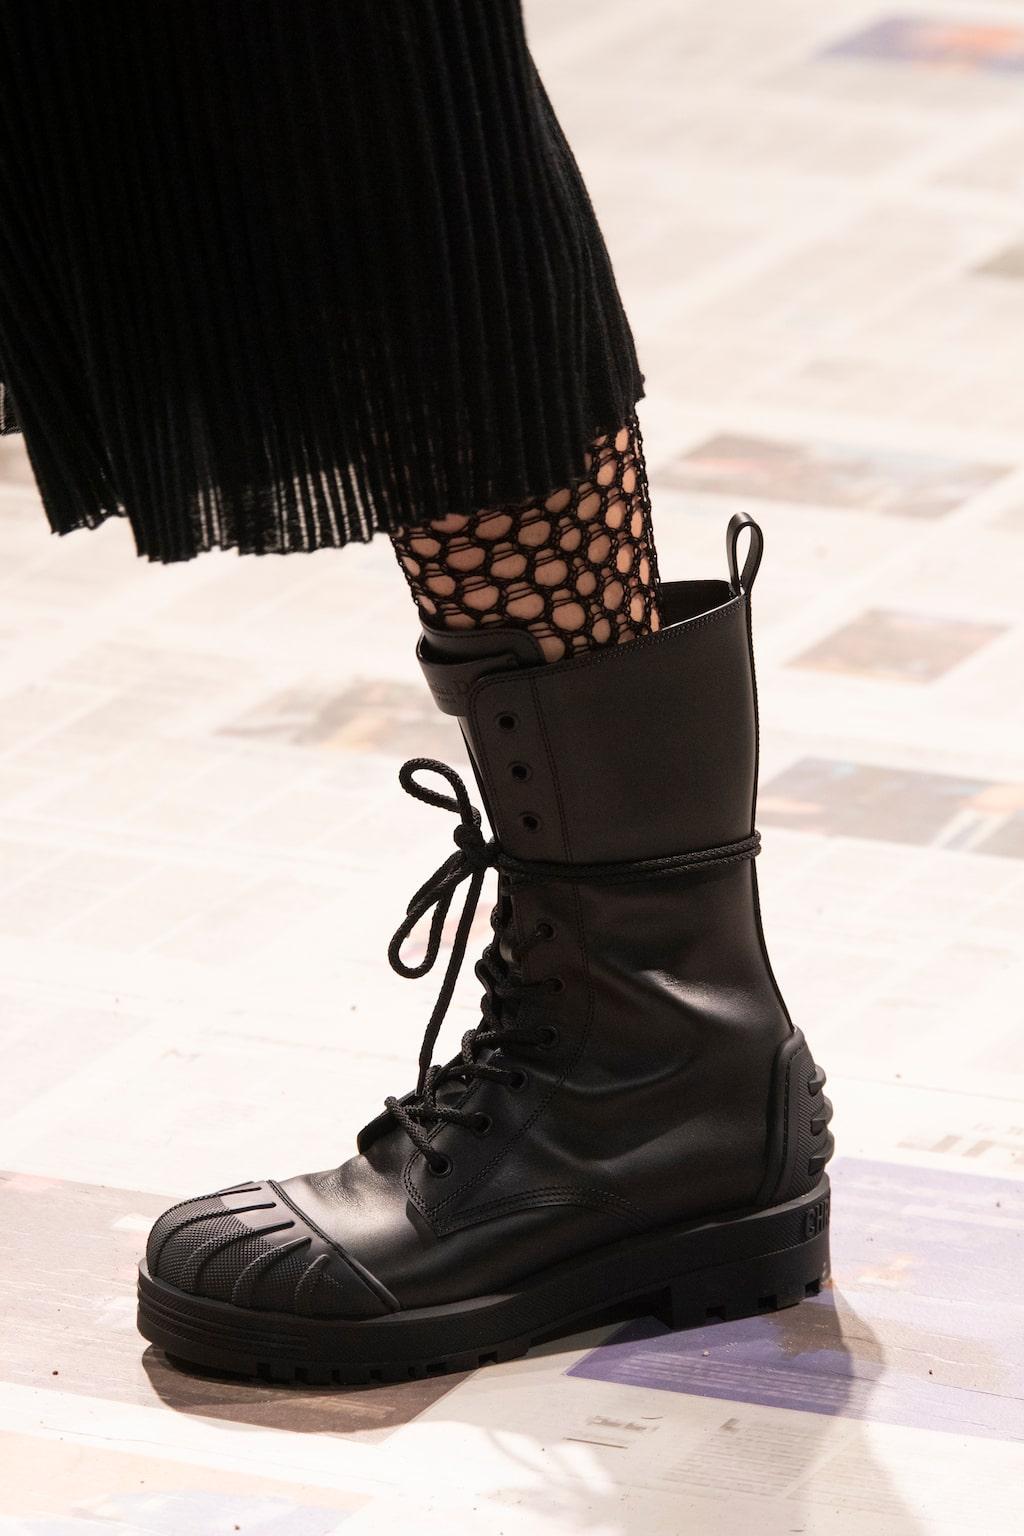 Höstmode 2020: lårhöga stövlar hos Dior AW20.